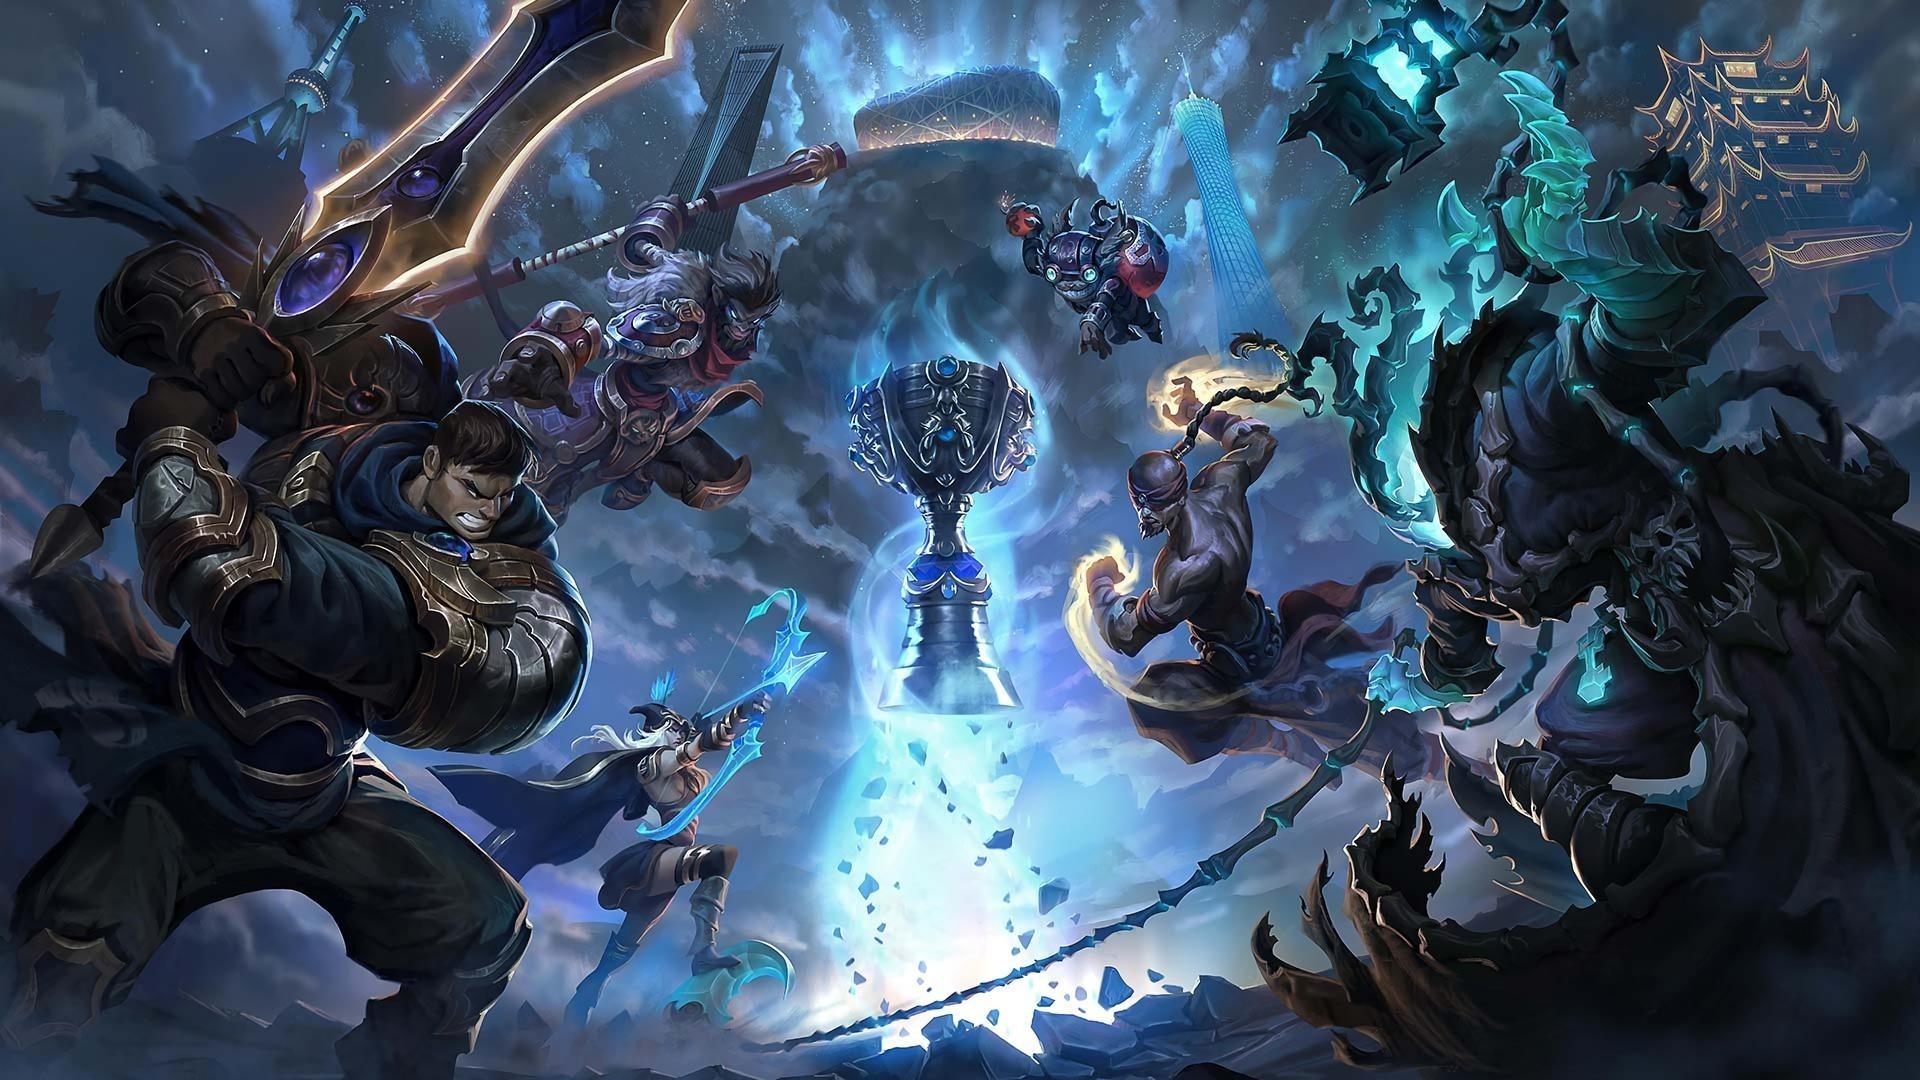 League Of Legends 1920x1080 wallpaper